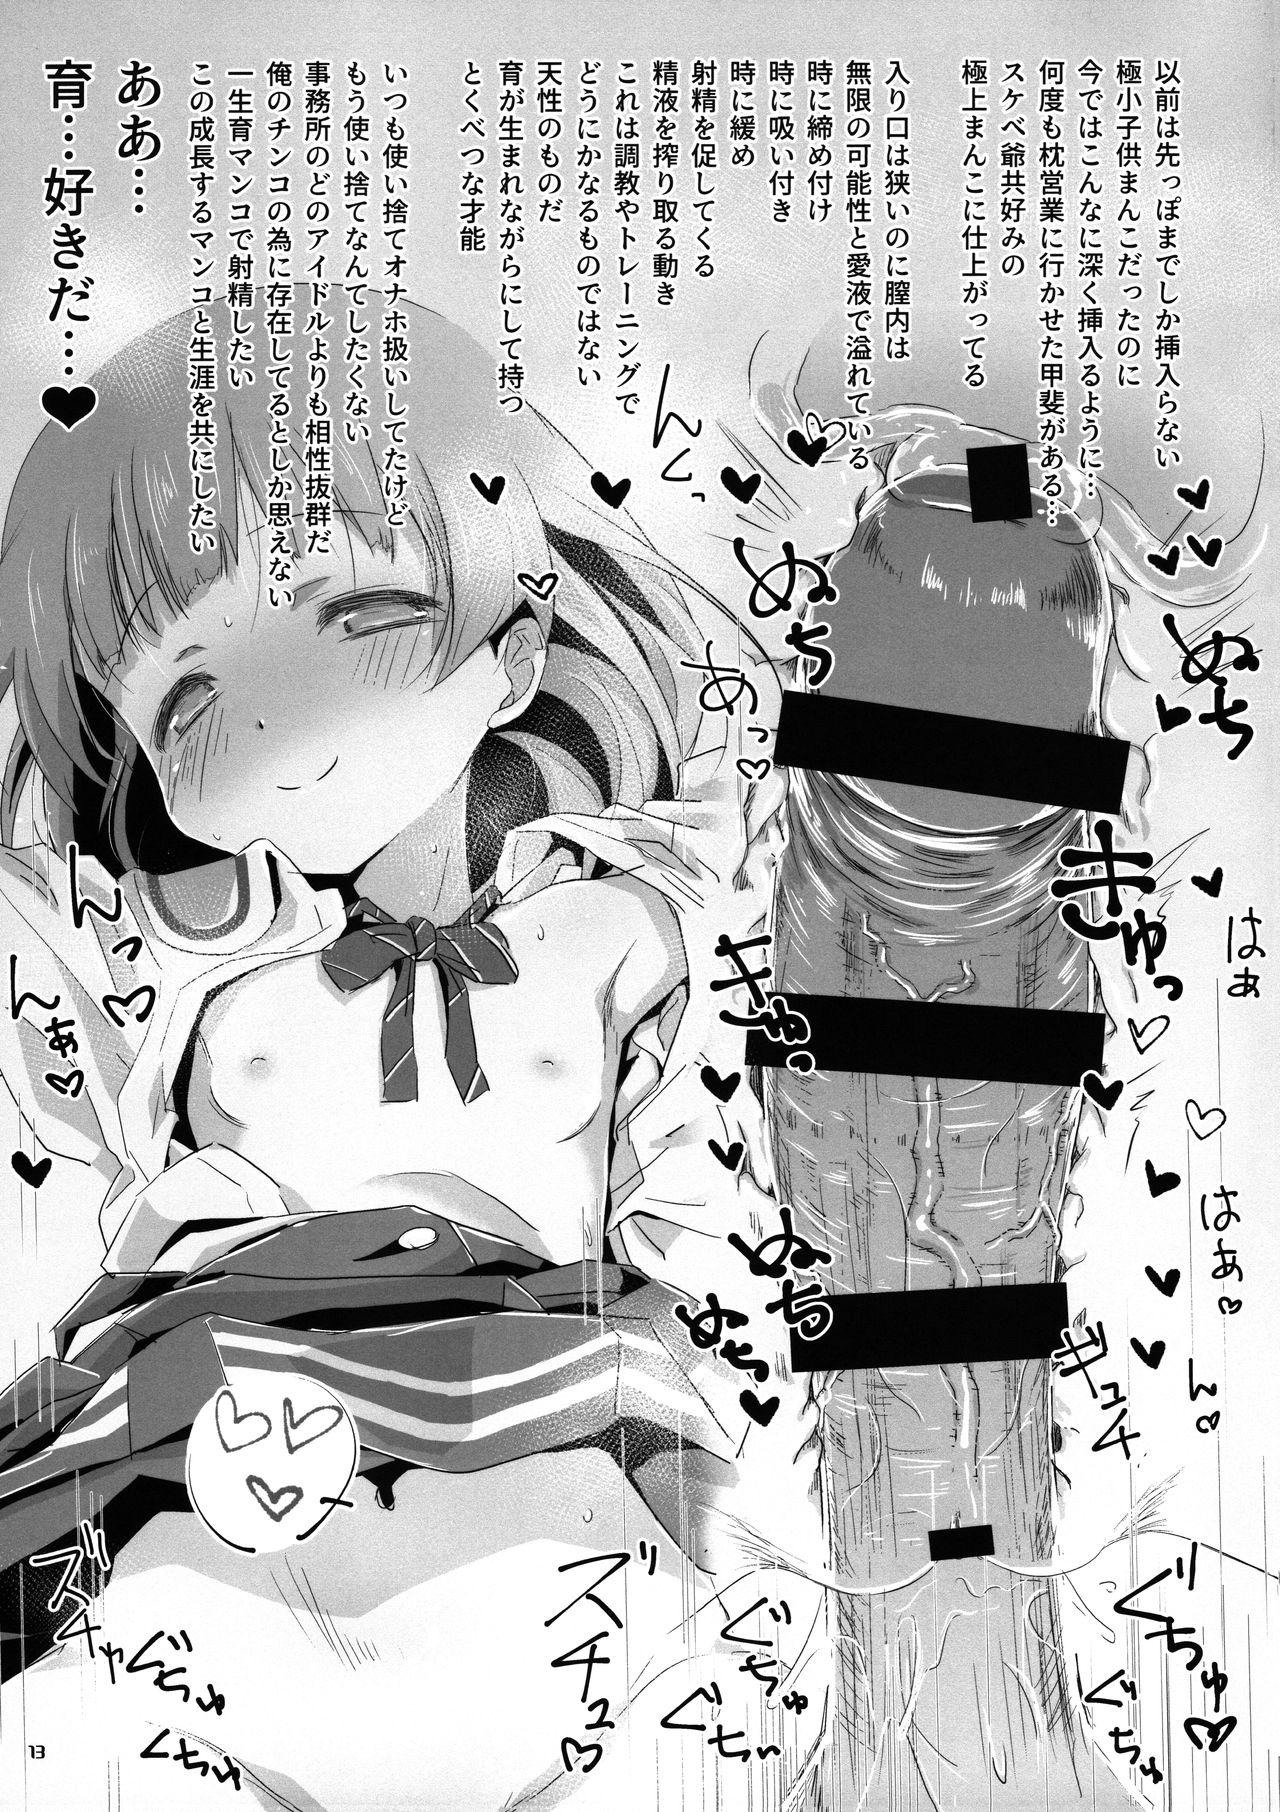 Beautiful Harmony + C96 Kaijou Gentei Omakebon Sailor Mizugi 11